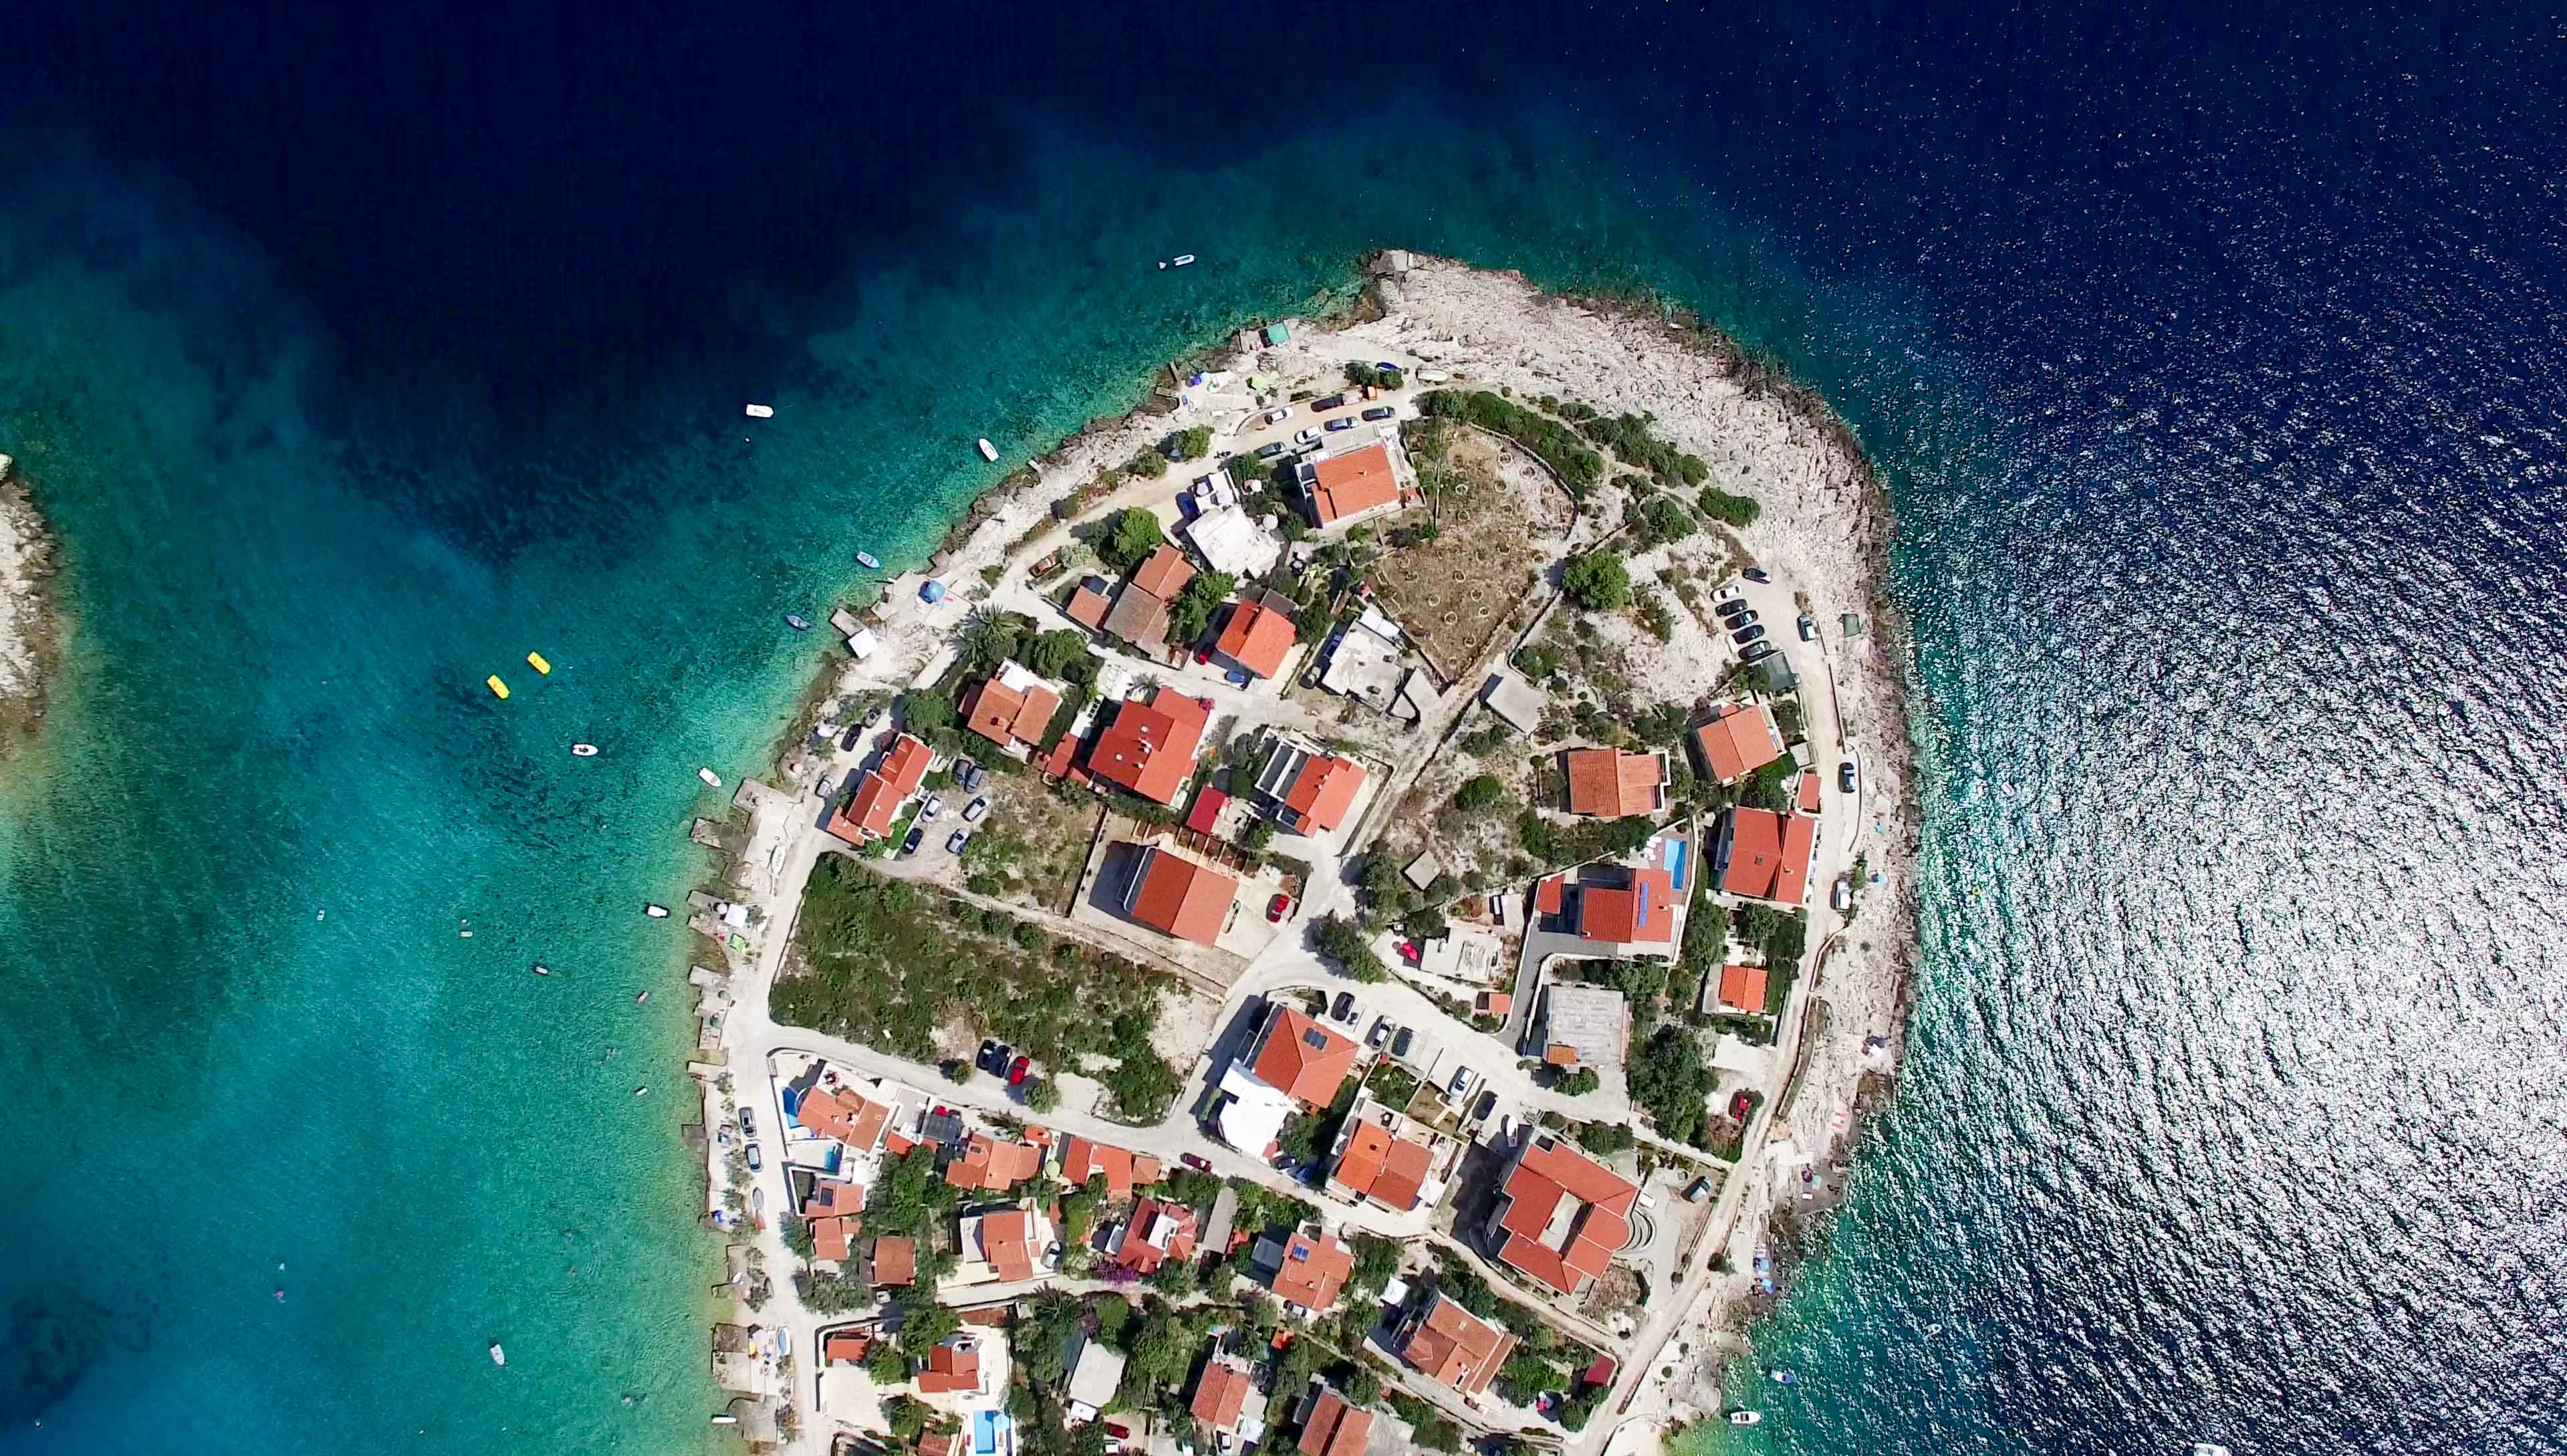 Aerial Photo of a Island